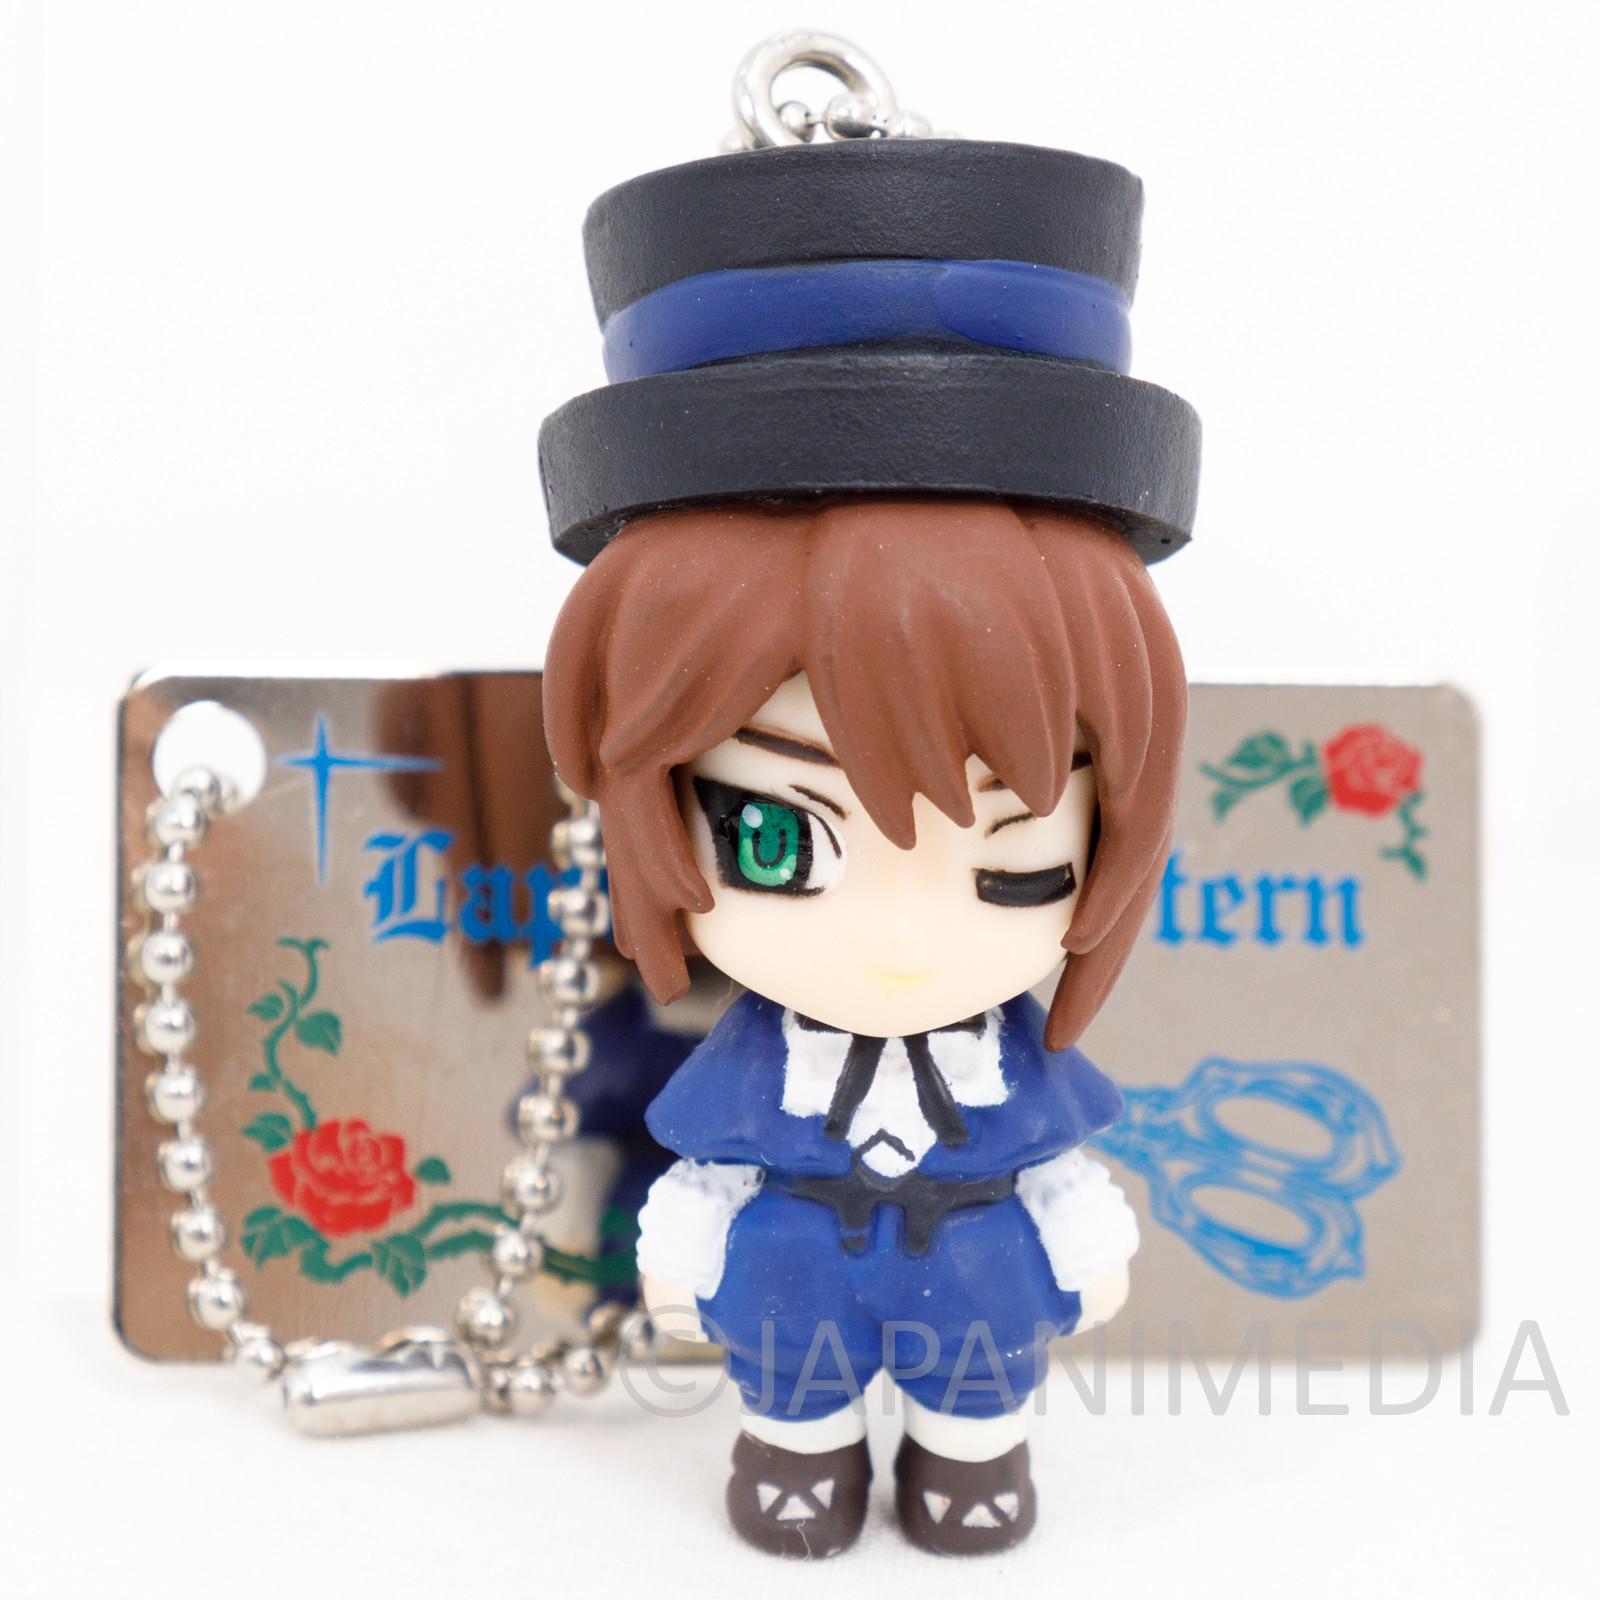 Rozen Maiden Souseiseki Mascot Figure Ballchain Yujin JAPAN ANIME